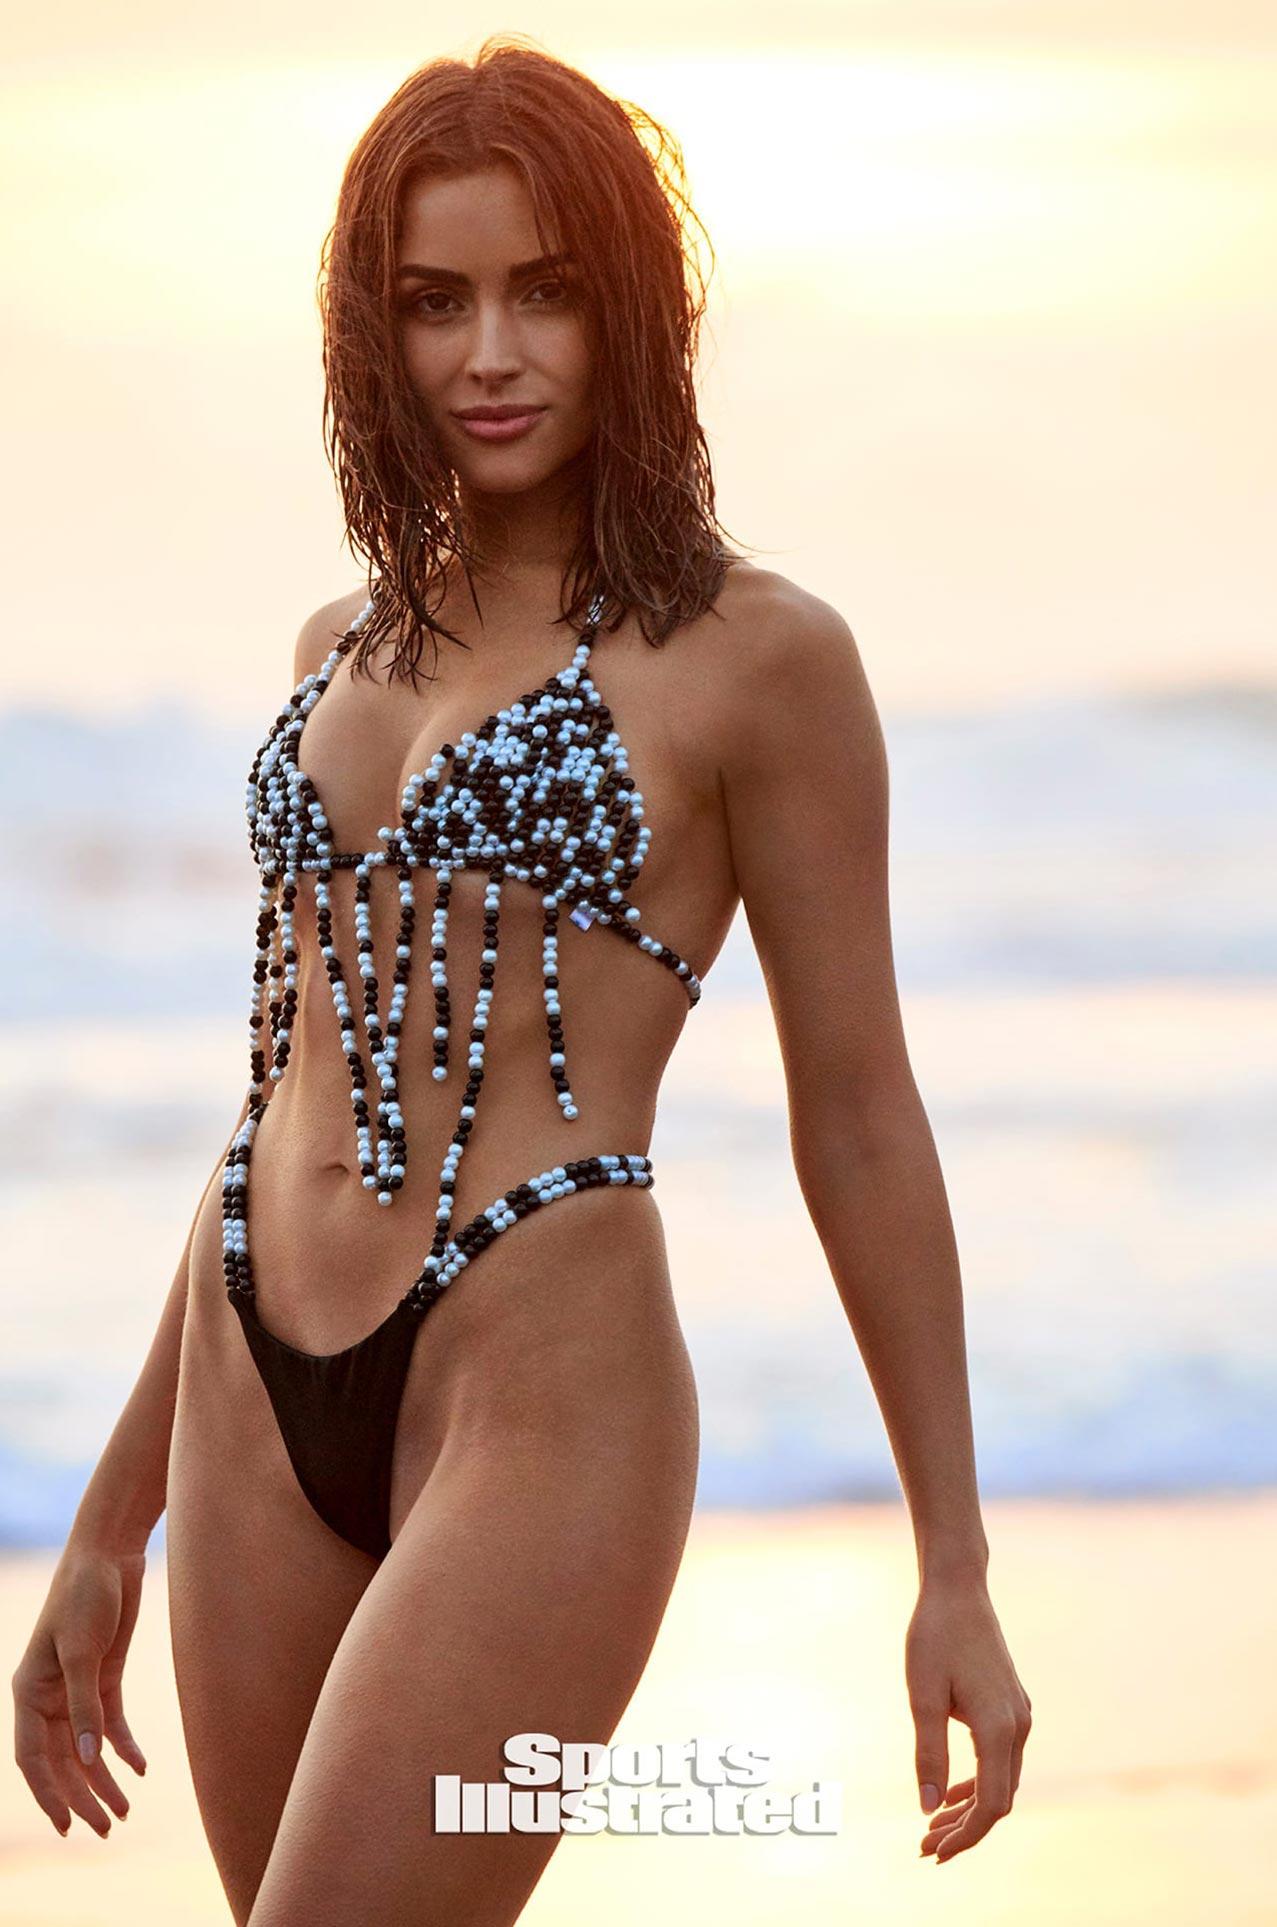 Оливия Калпо в каталоге купальников Sports Illustrated Swimsuit 2020 / фото 22